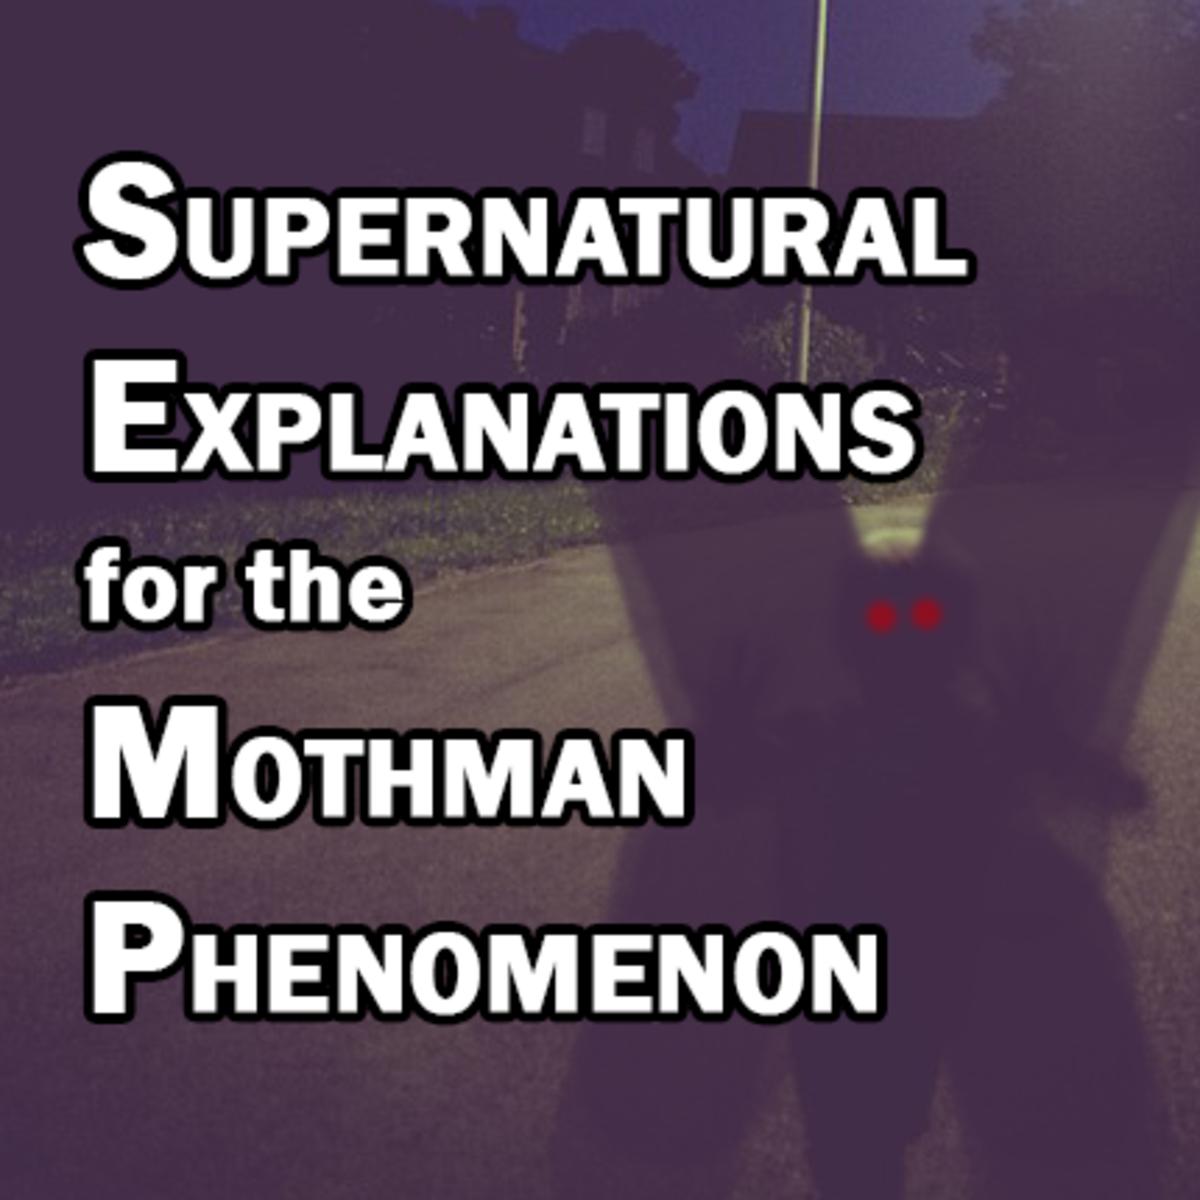 Supernatural Explanations for the Mothman Phenomenon